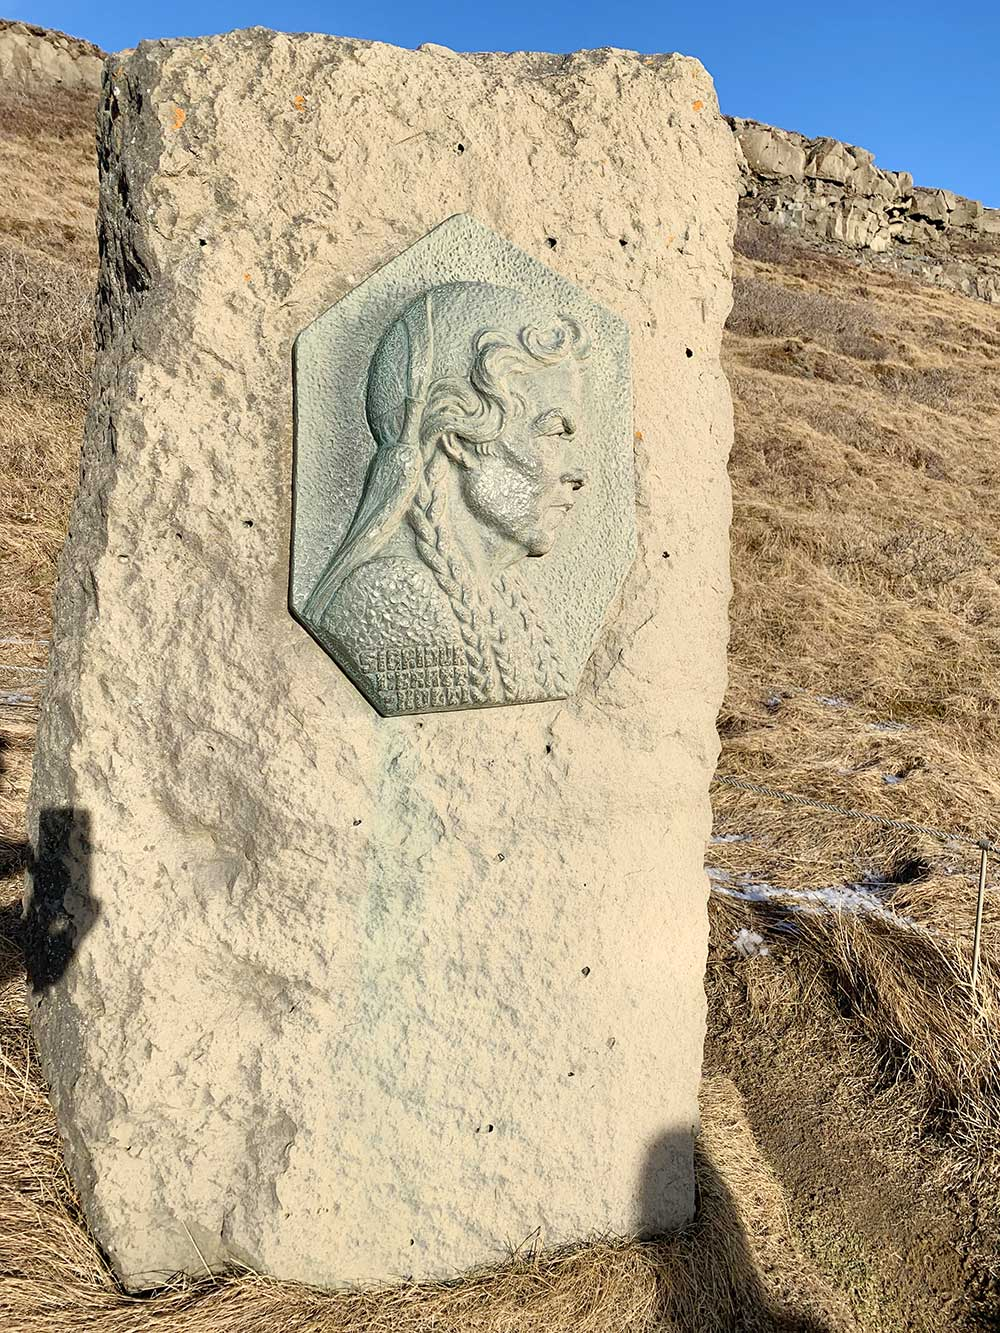 Memorial en honor a Sigríður Tómasdóttir